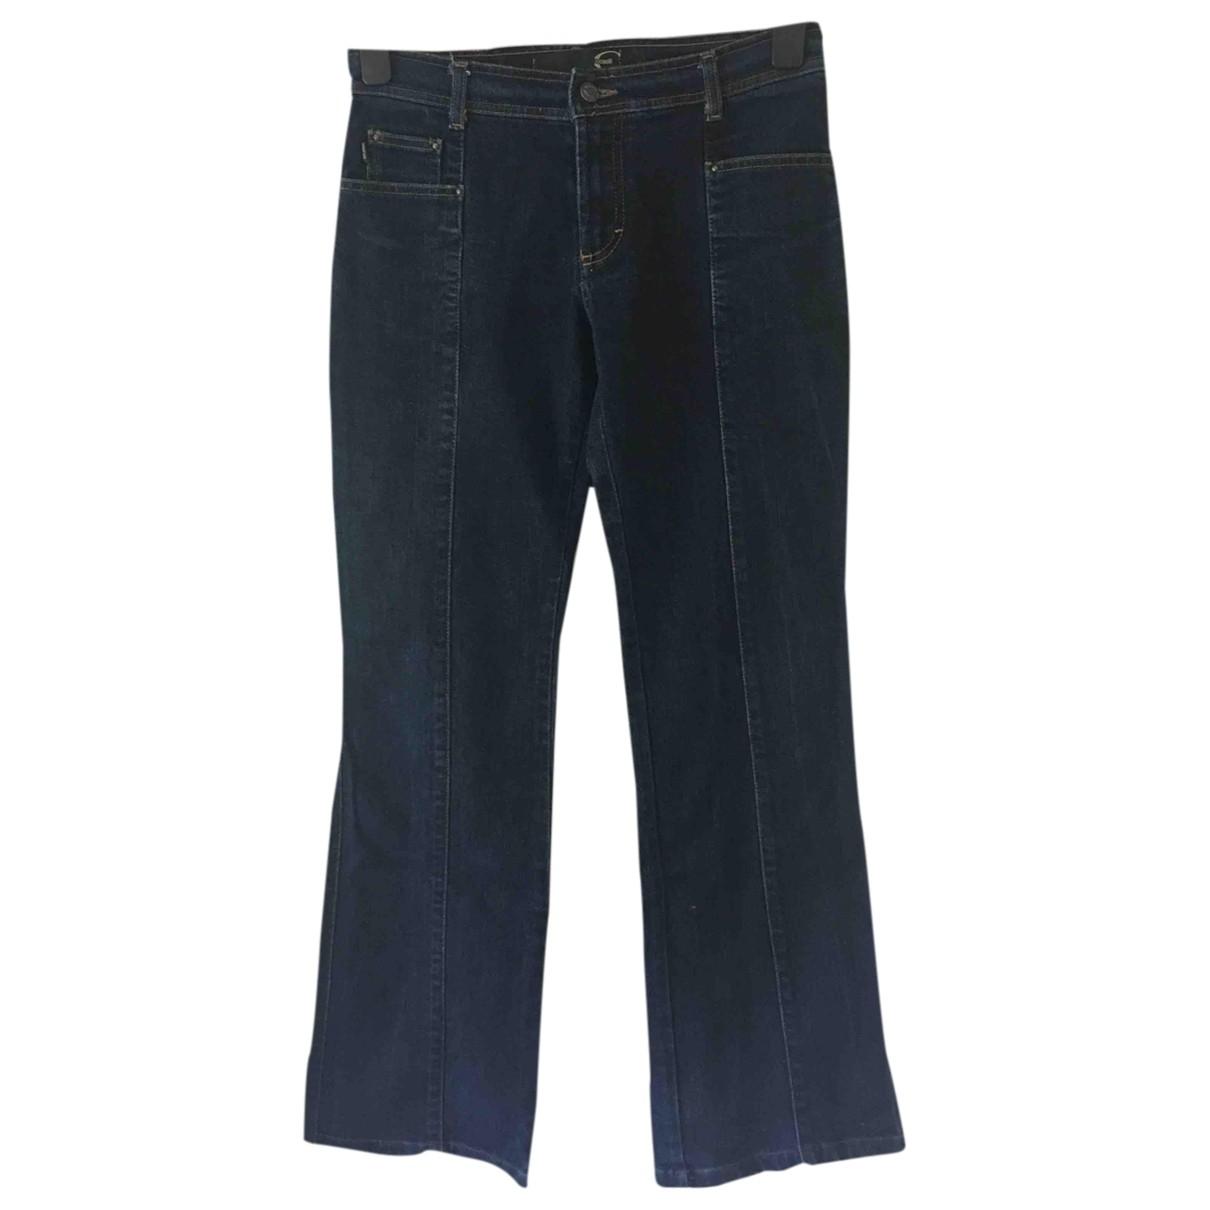 Just Cavalli \N Blue Denim - Jeans Jeans for Women 38 FR